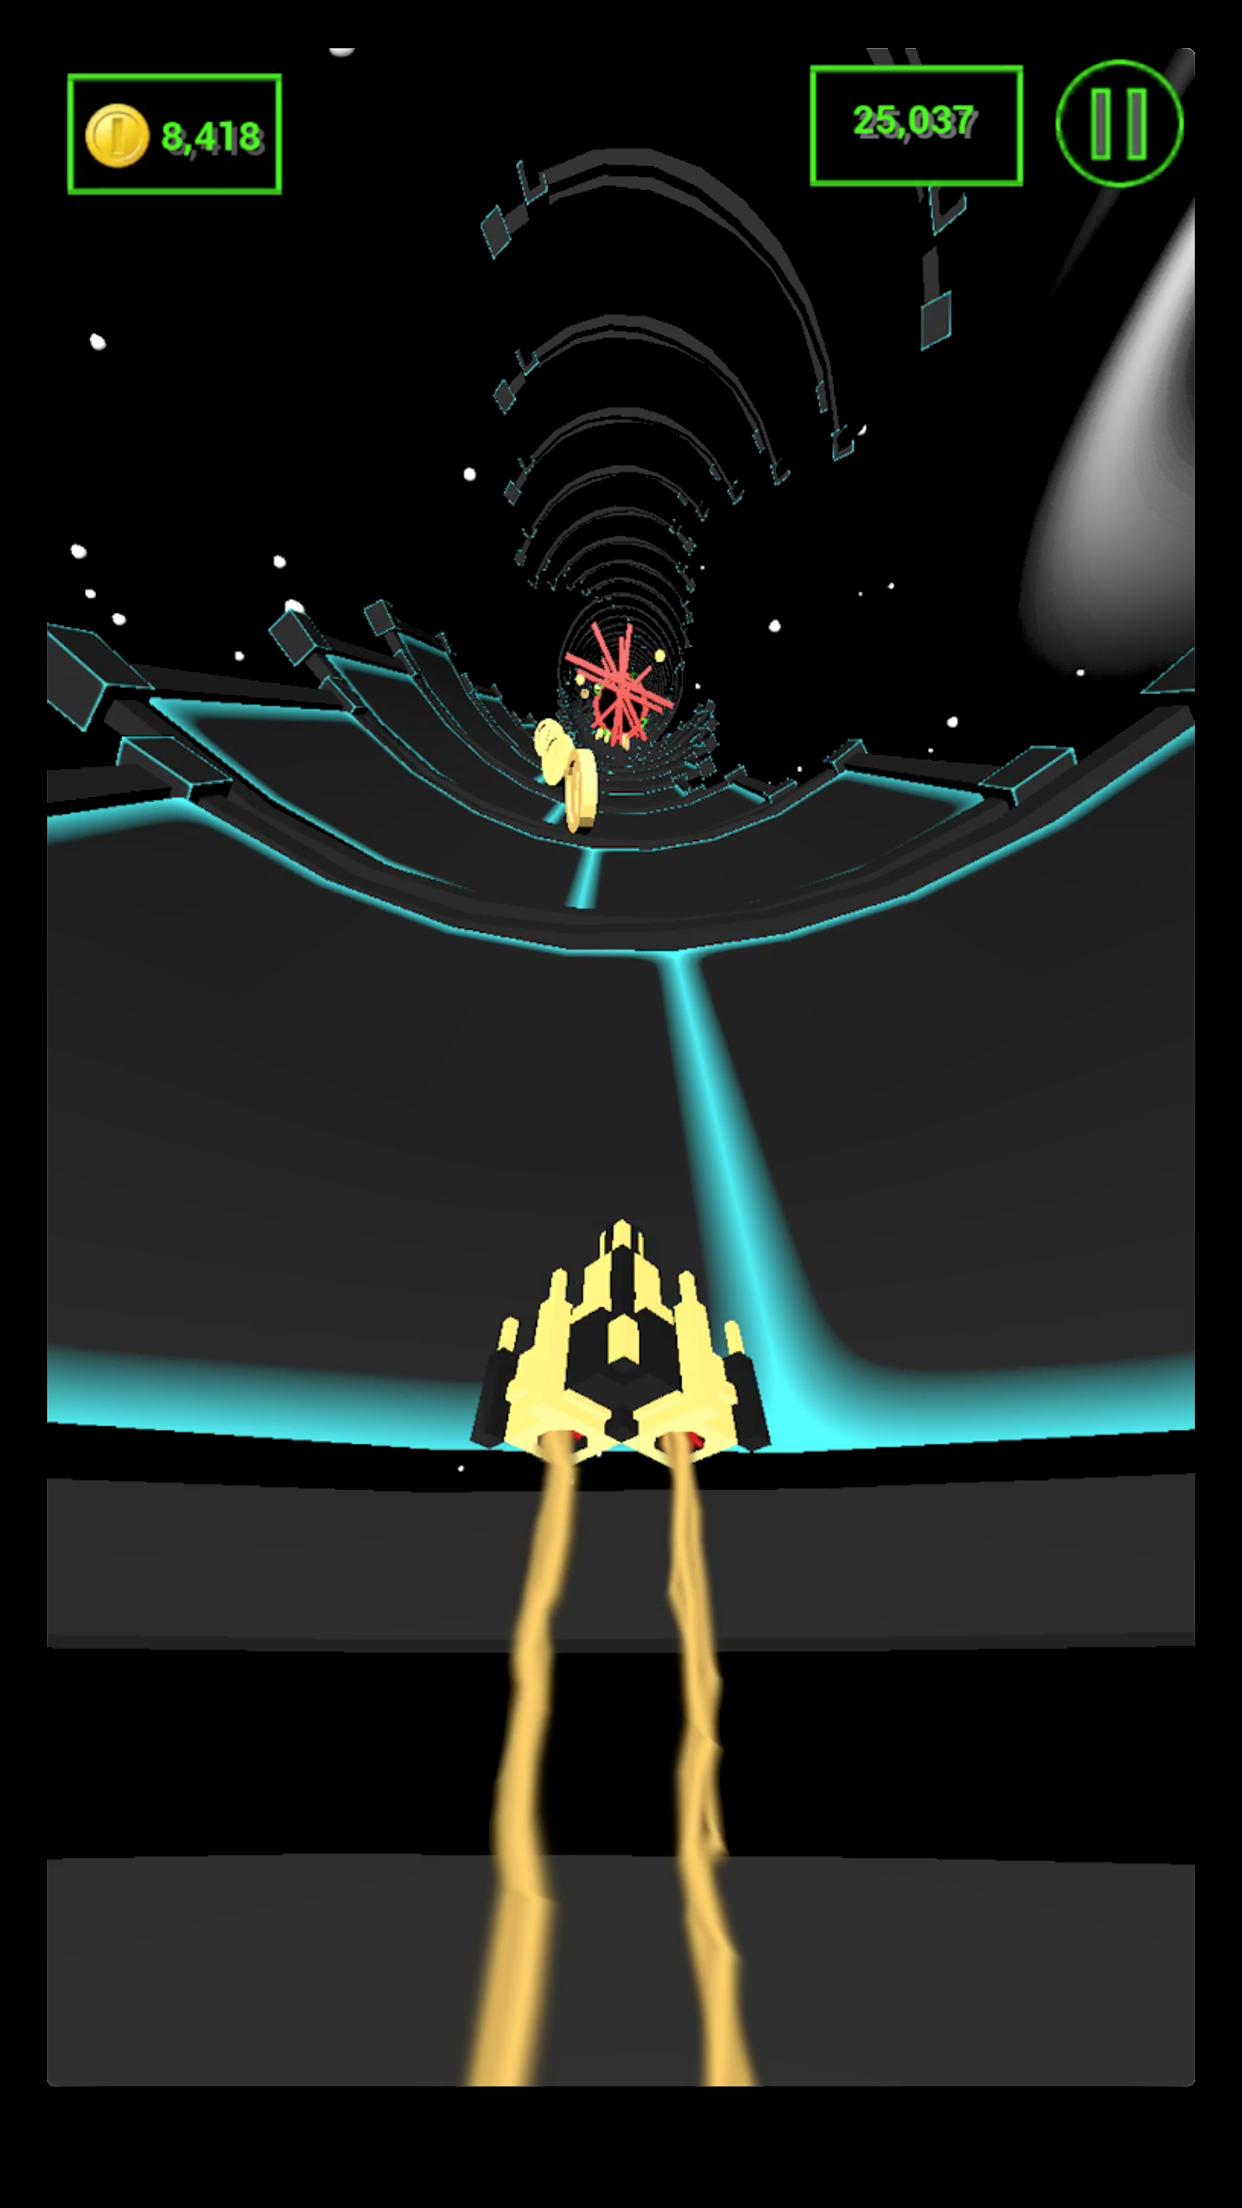 Sphone 2